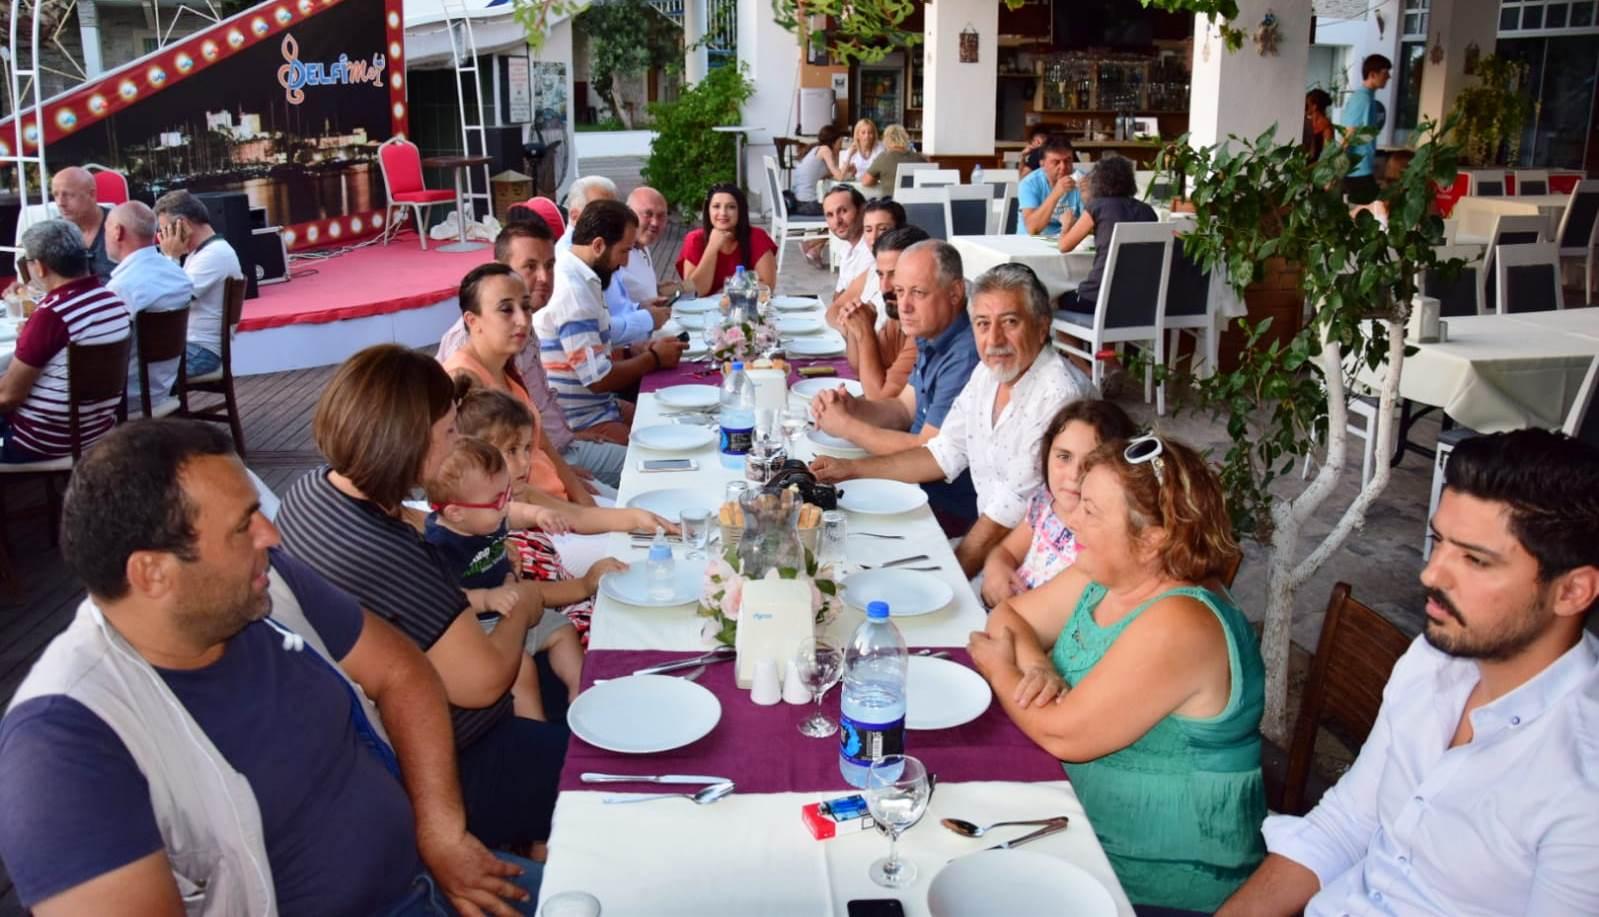 basın AK PARTİ BASIN MENSUPLARININ BAYRAMINI KUTLADI… ak parti basin mensuplari yemek 3